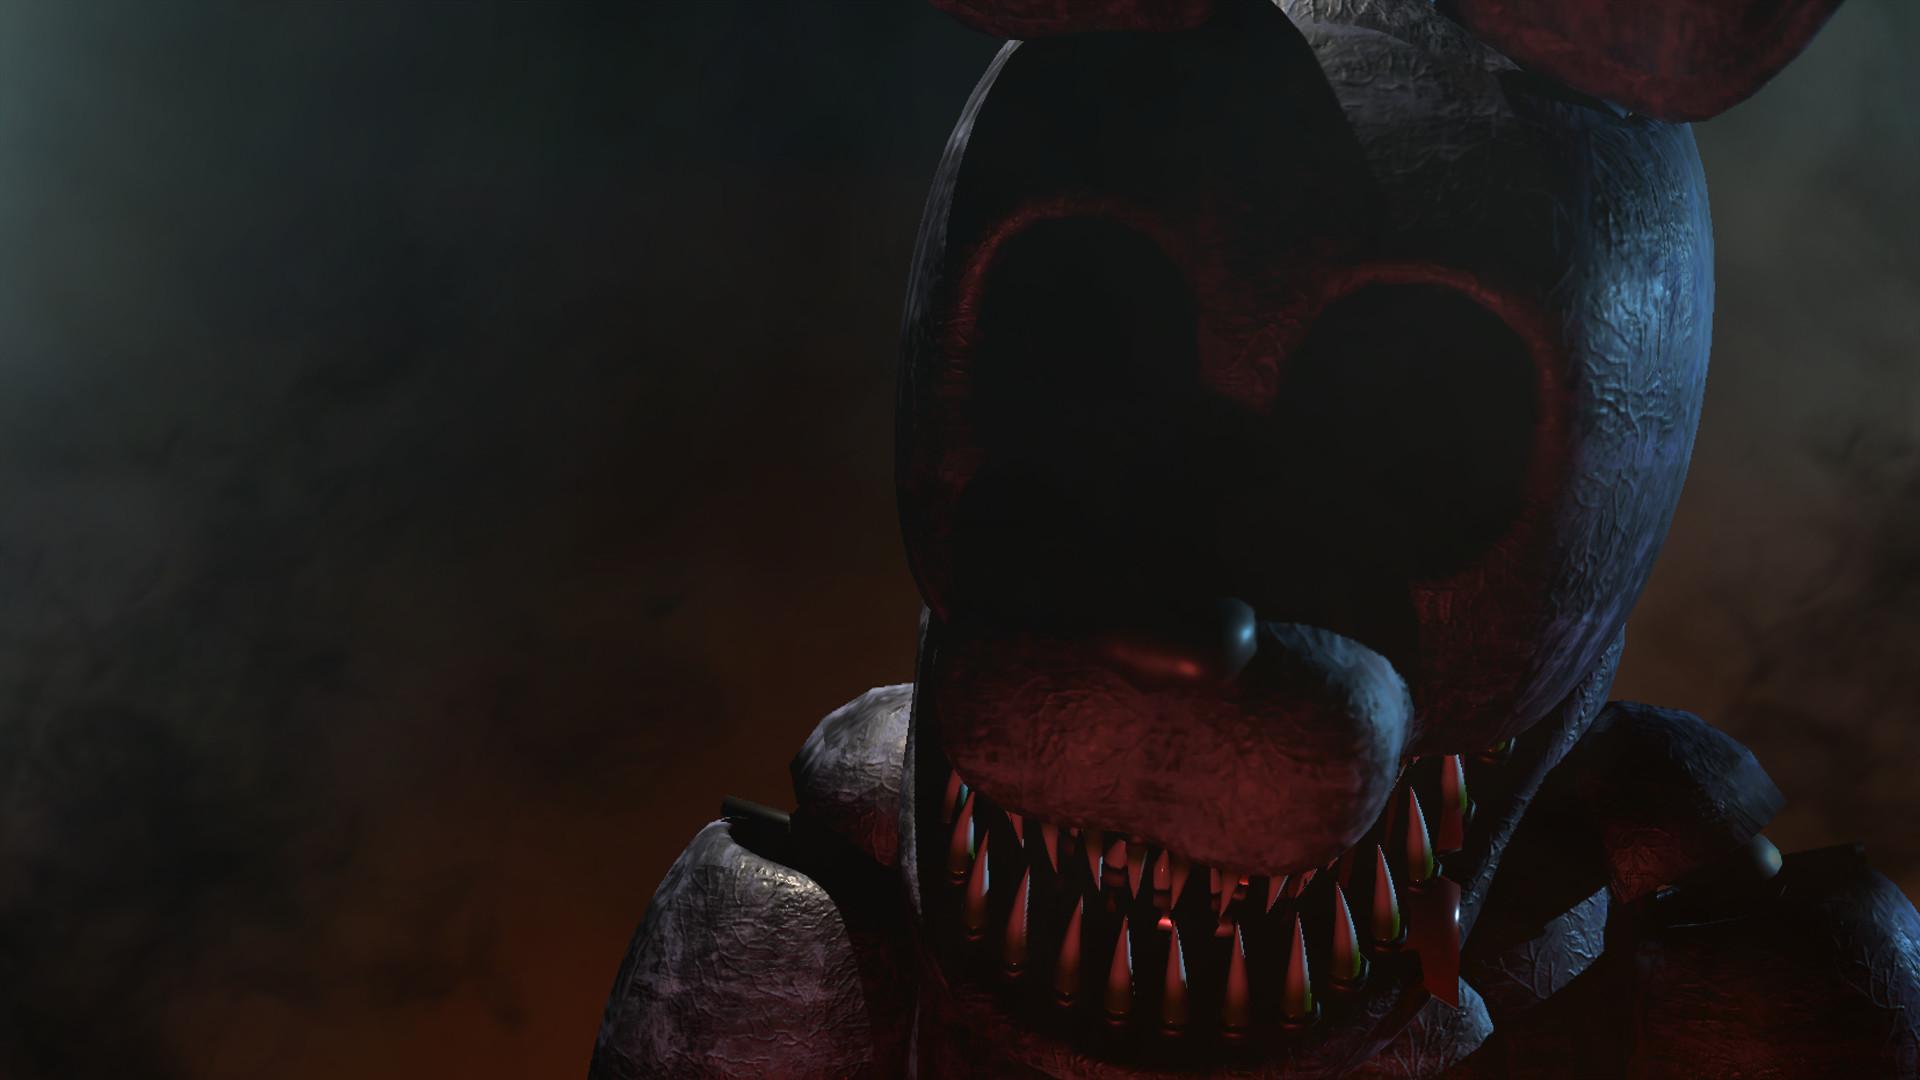 Sinister Bonnie | Official Sinister Turmoil Wikia | FANDOM powered by Wikia